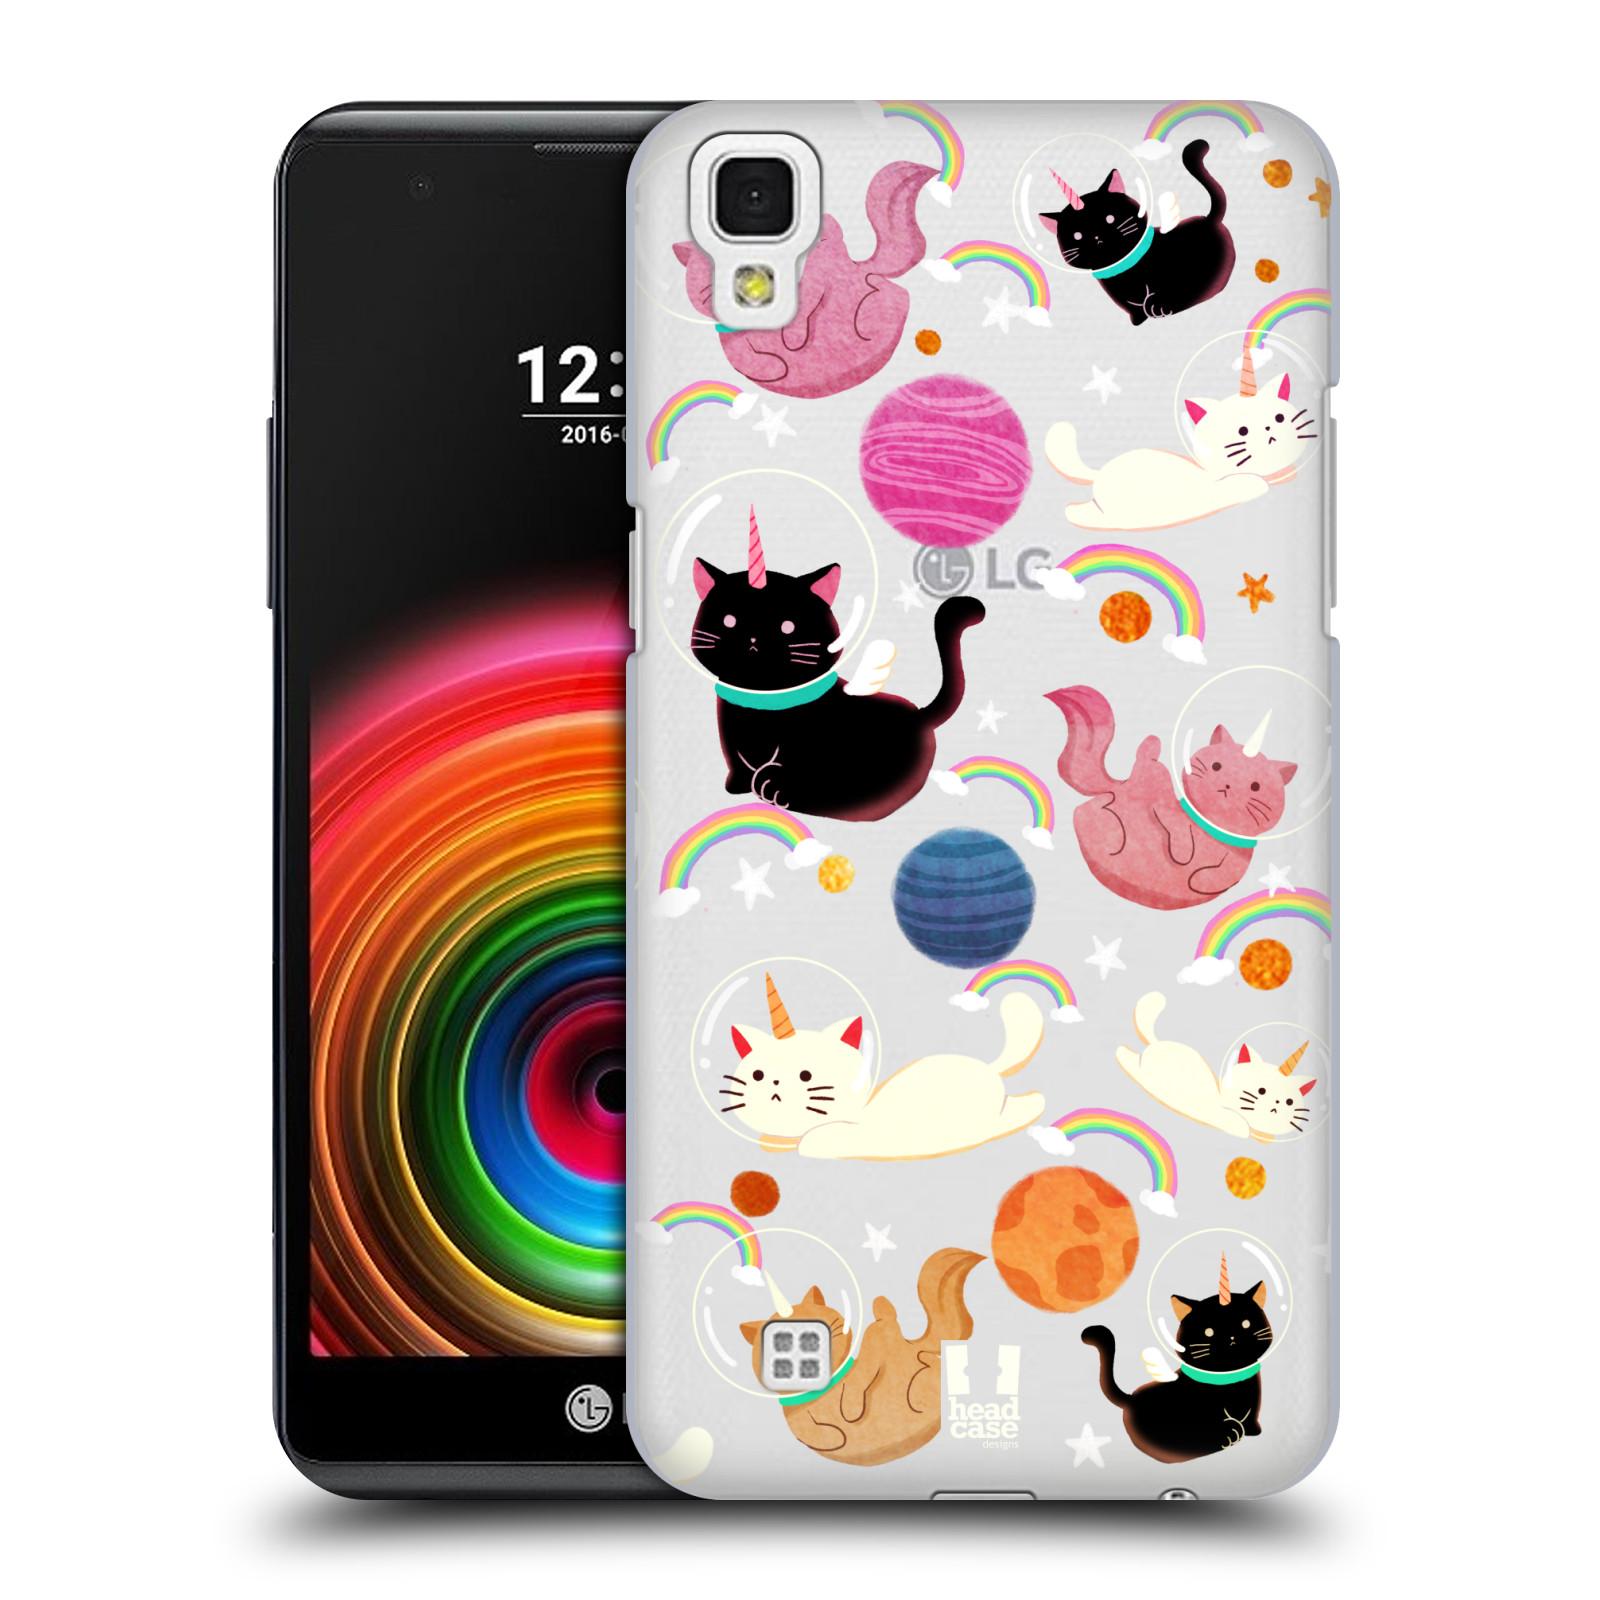 Case-Designs-espacio-Unicornios-duro-HEAD-Funda-Trasera-Para-Telefonos-LG-2